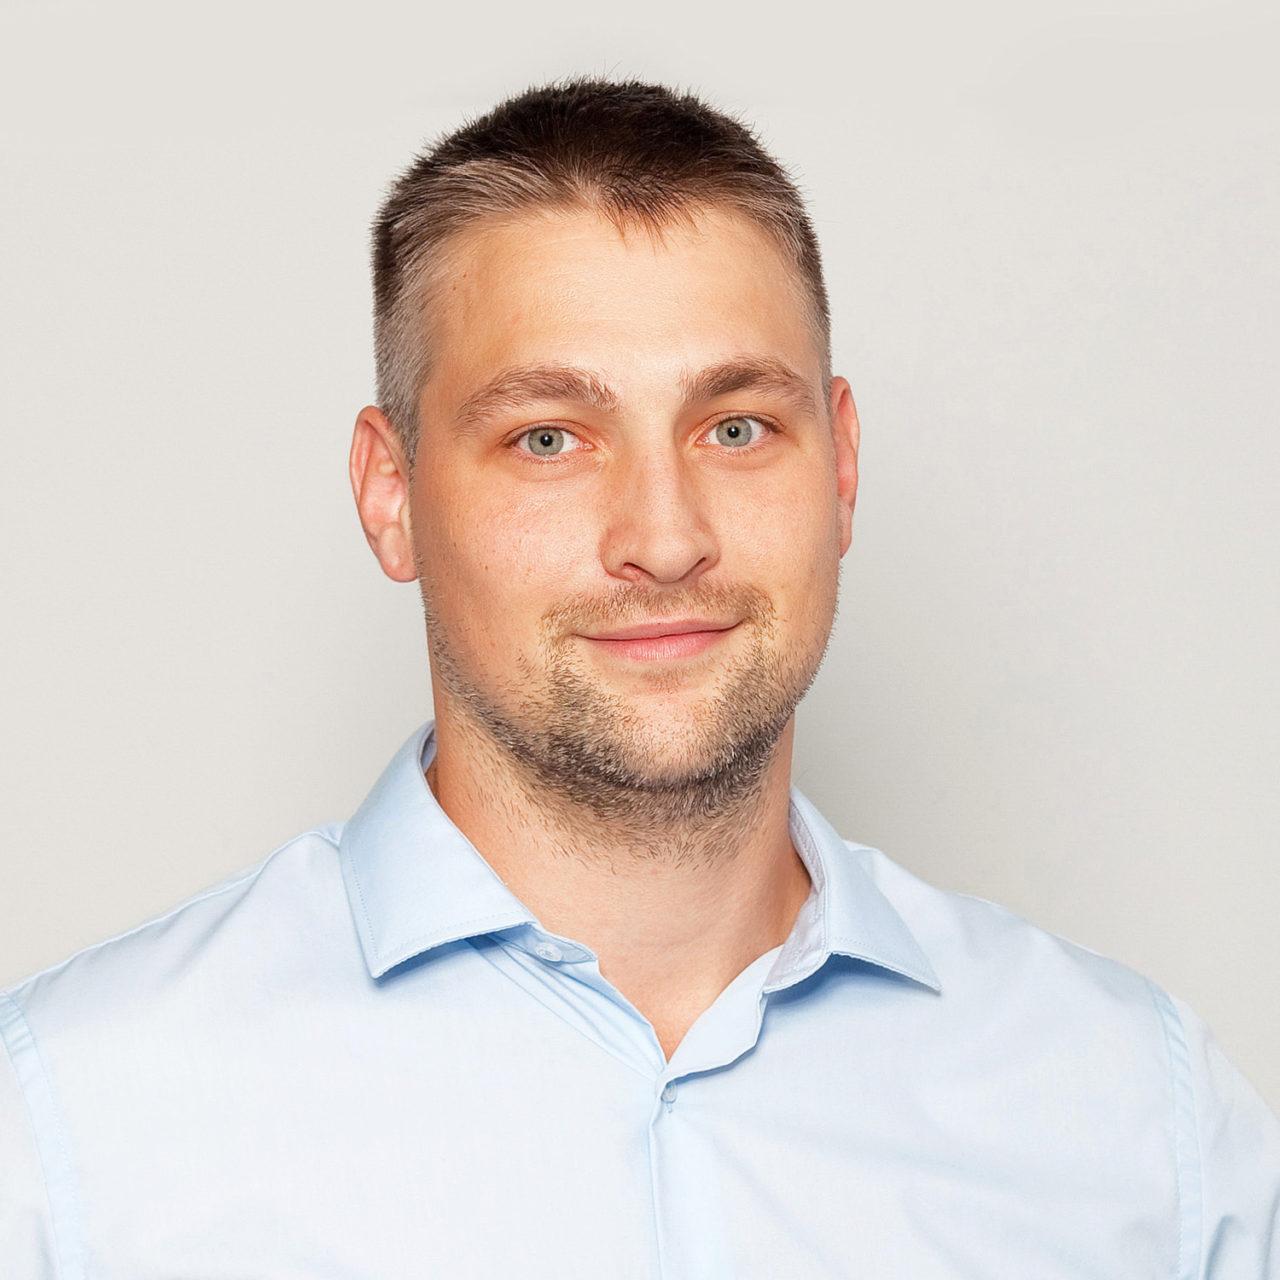 Scott Leach Projektabwicklung Endeco Gmbh